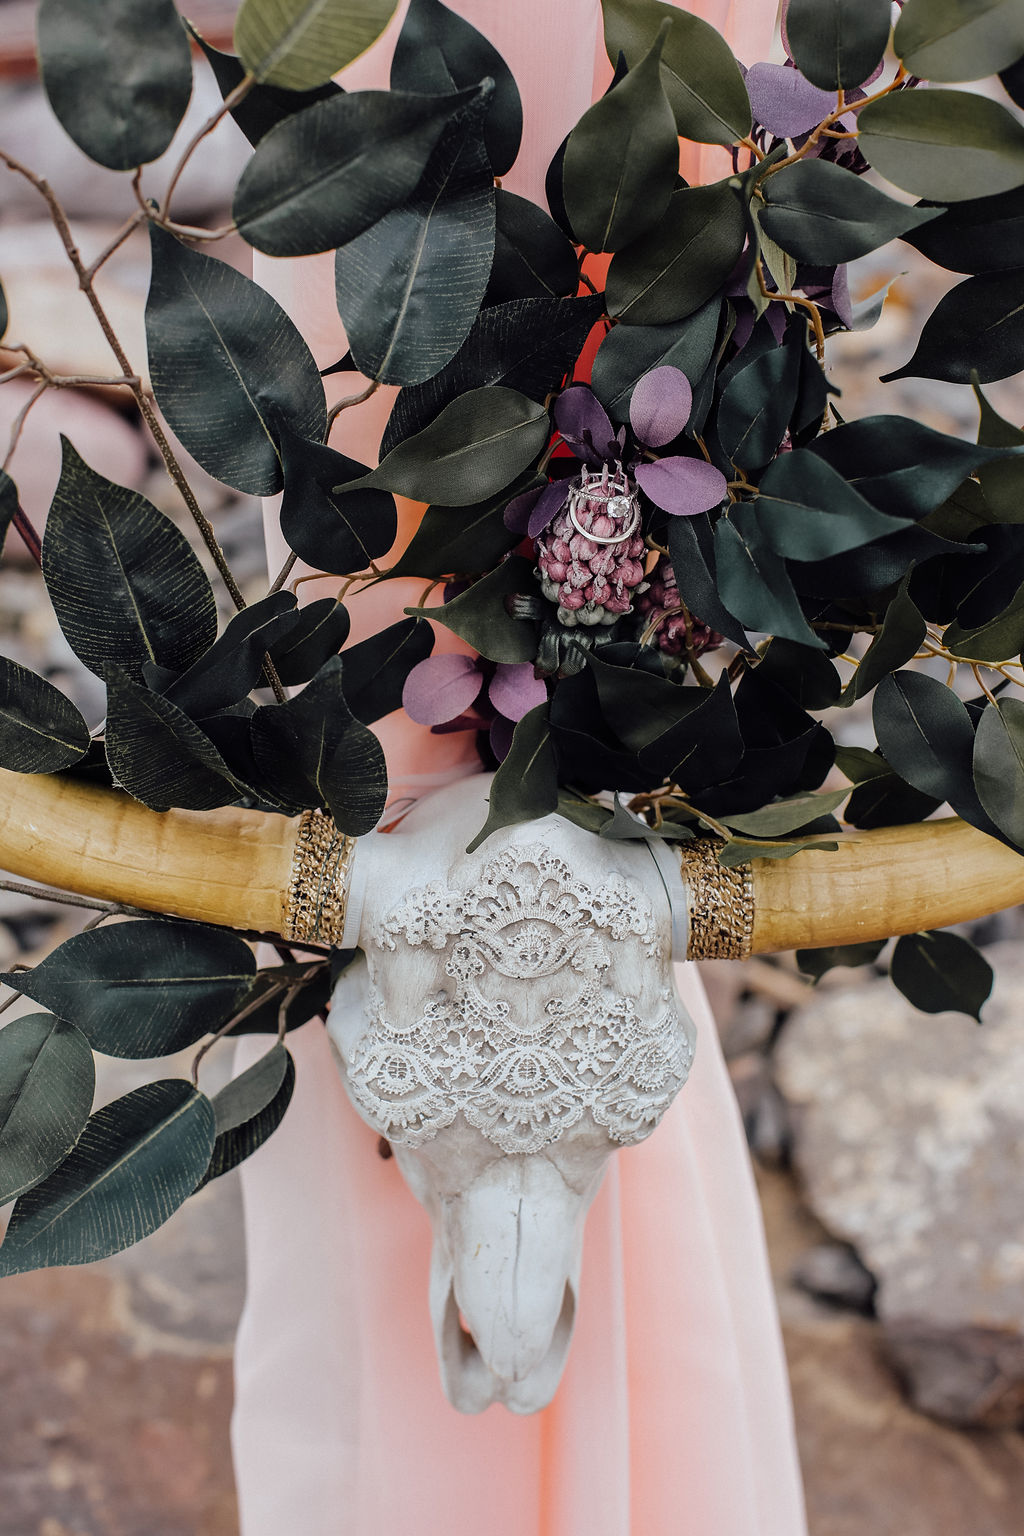 509 Bride_the 509 bride_purple pineapple photography_9